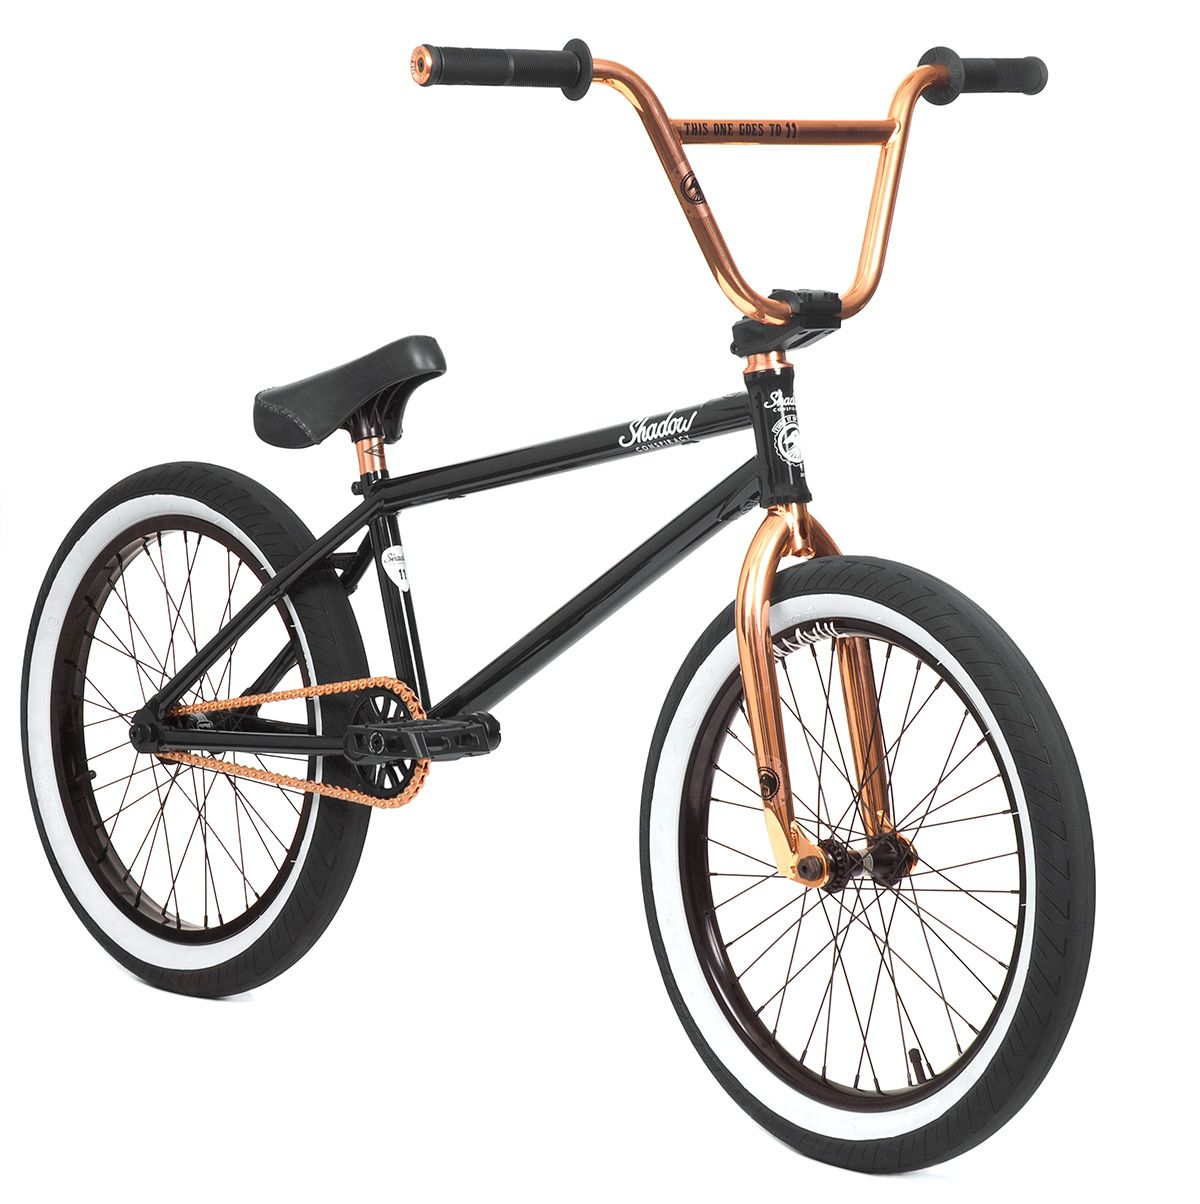 Shadow X Subrosa Turn It To 11 Bike   Bmx   Pinterest   Junge mode ...